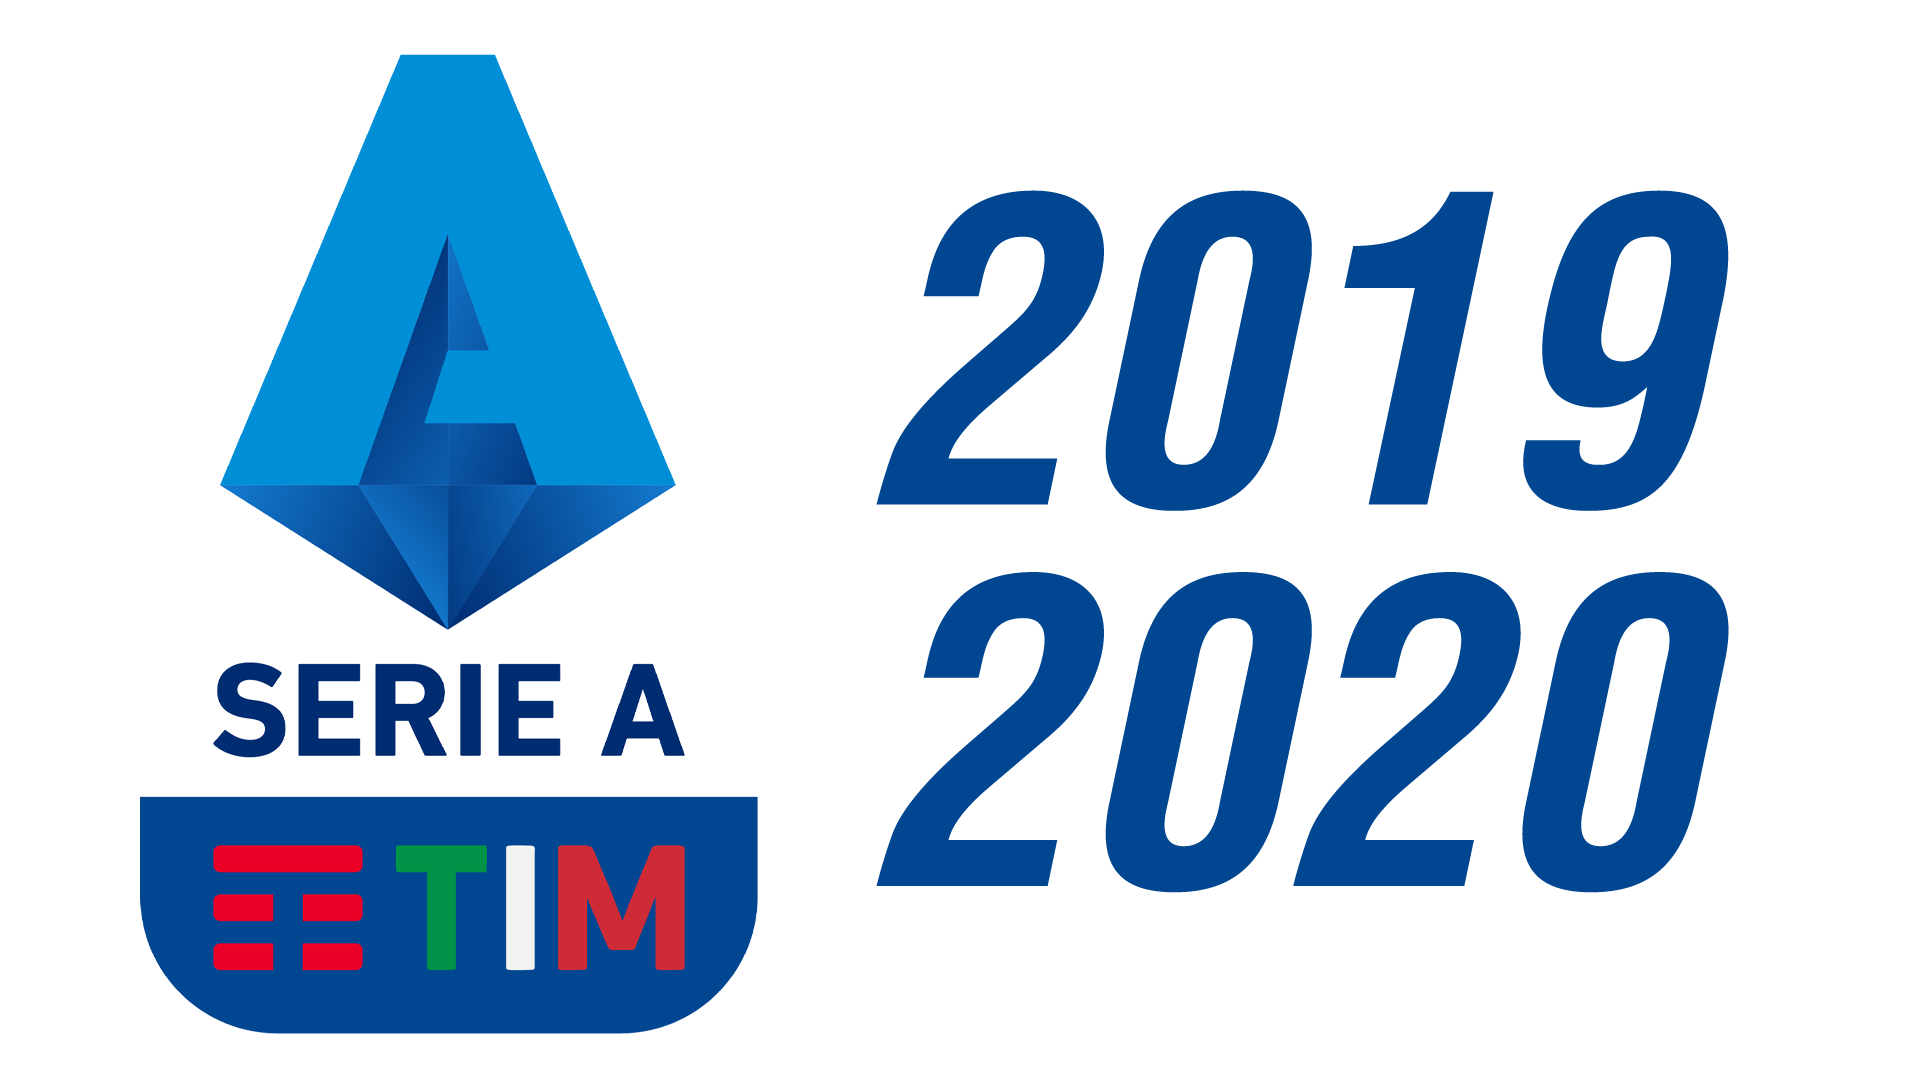 Calendario Partite Dazn.Calendario Serie A 2019 2020 Quando E Dove Vedere Le